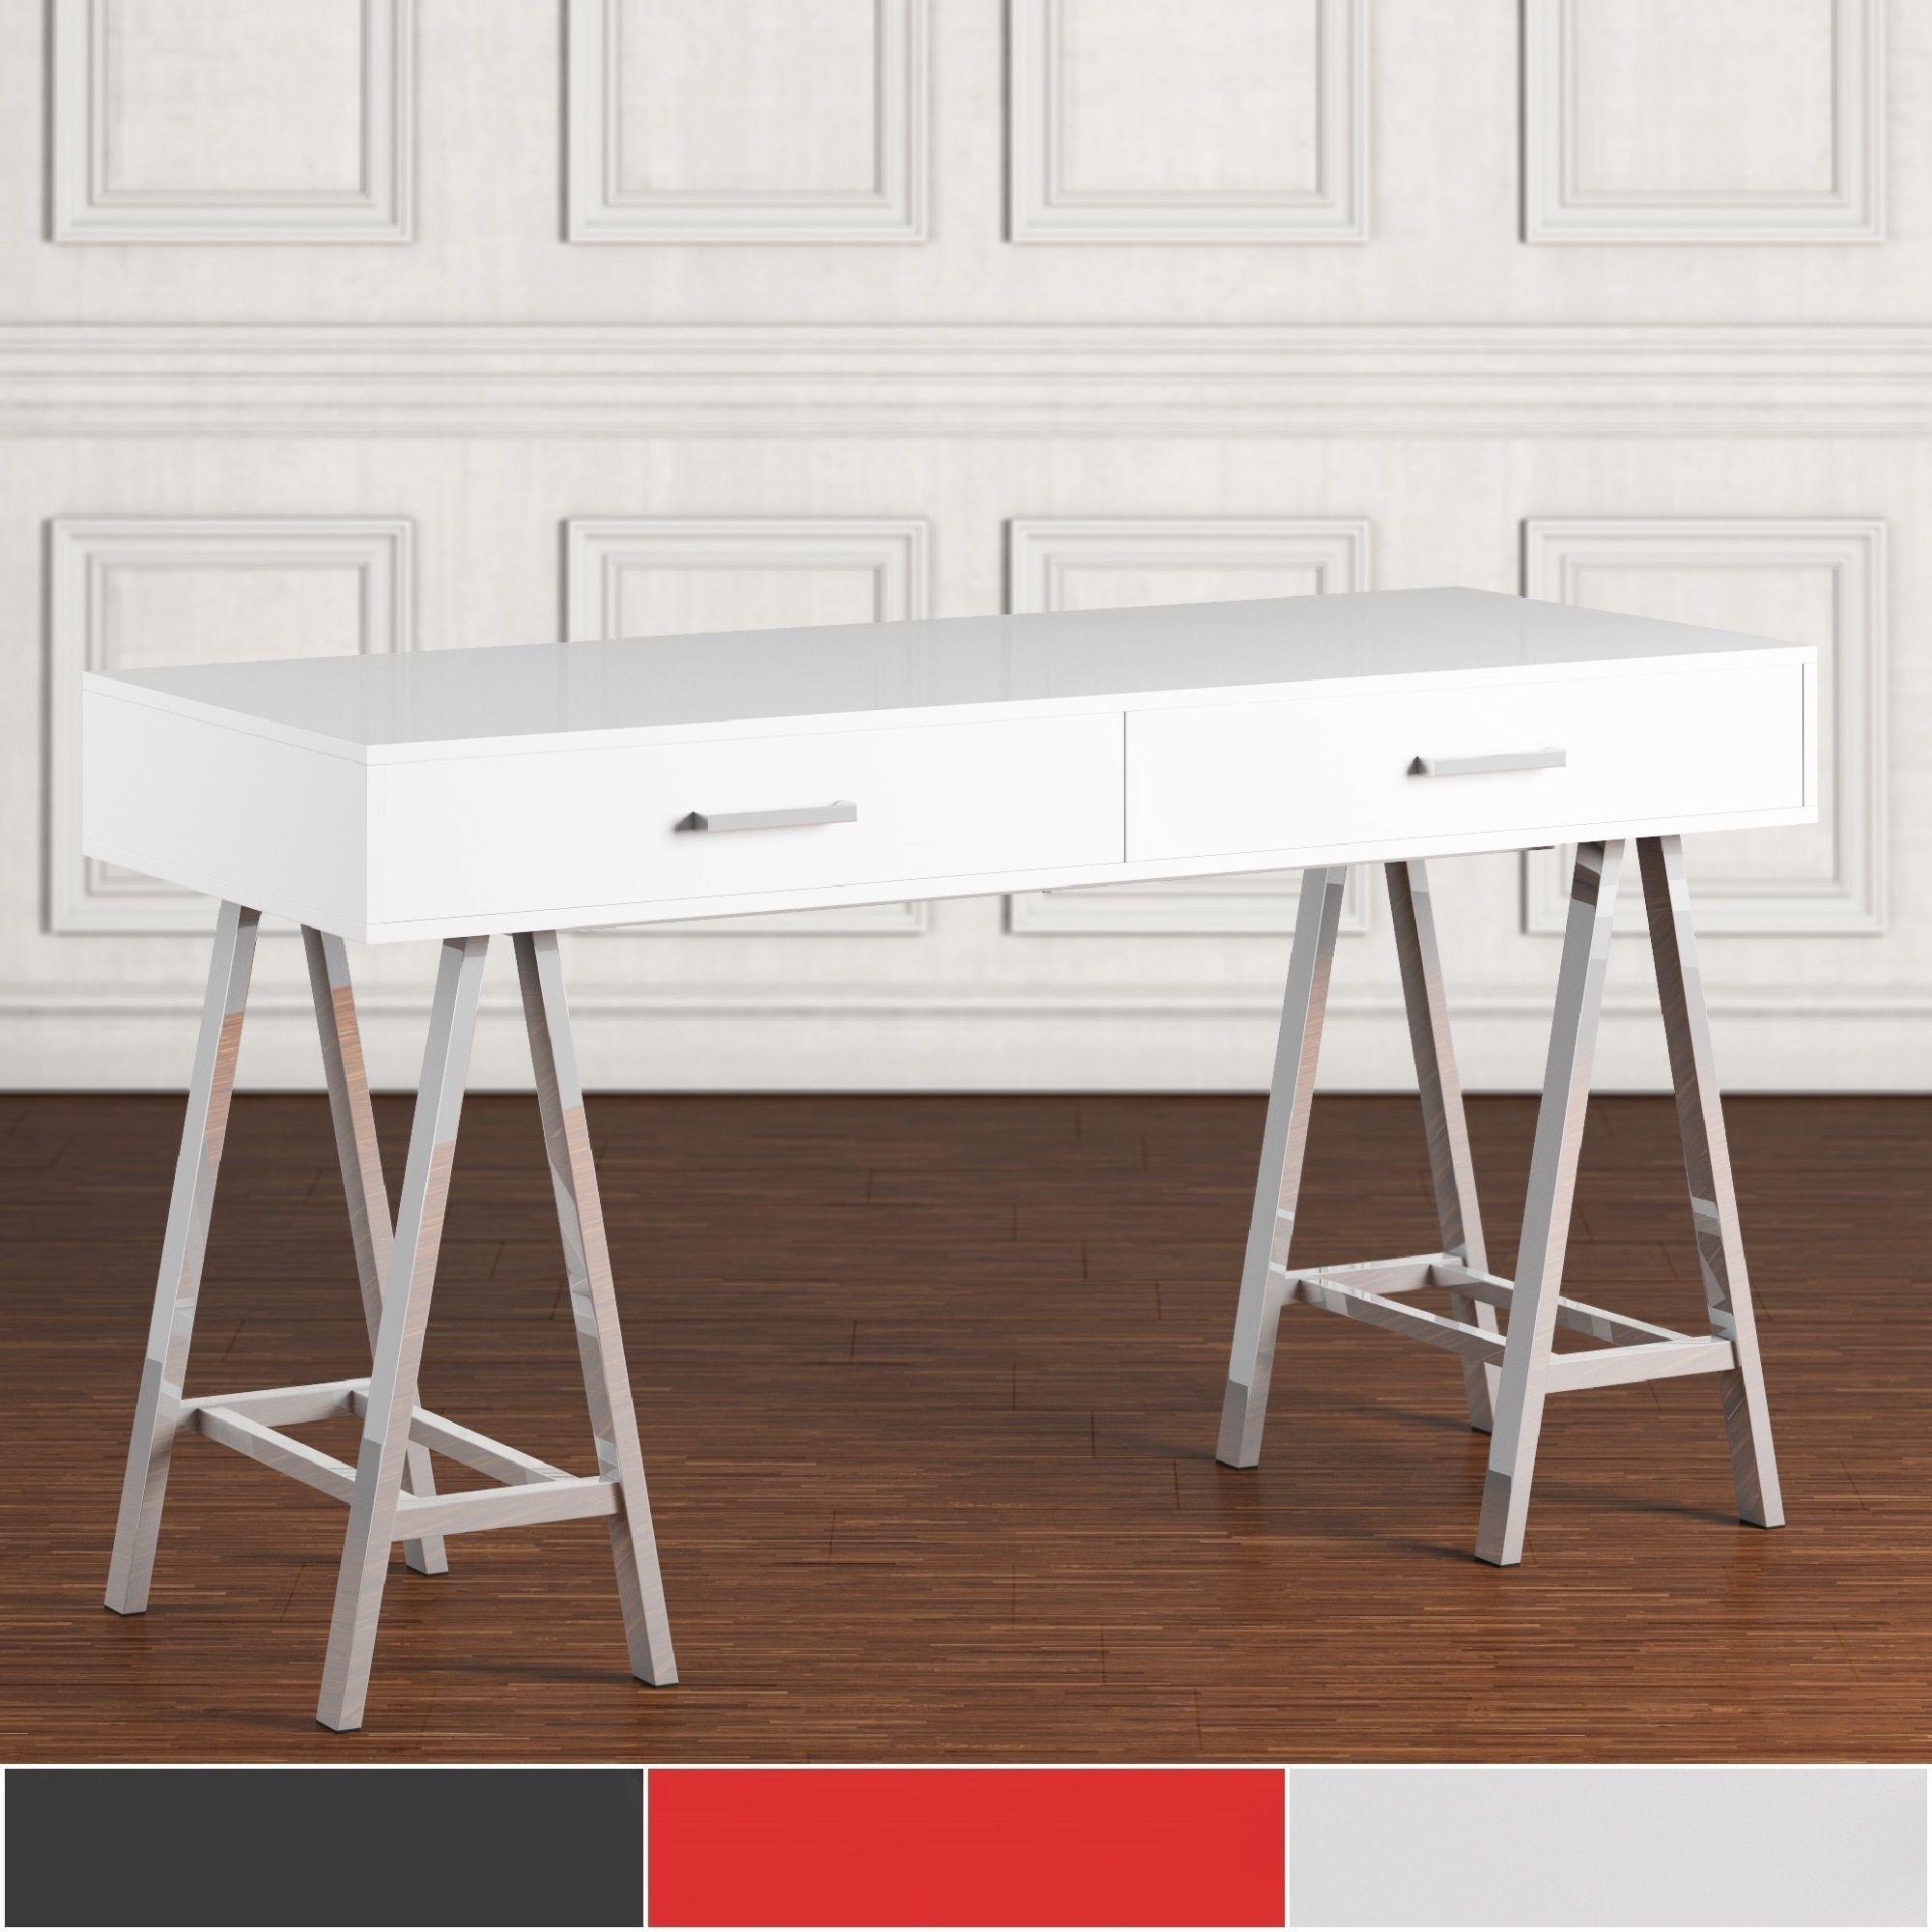 Neron 2-Drawer Chrome Leg Sawhorse Desk by Inspire Q (White), Silver